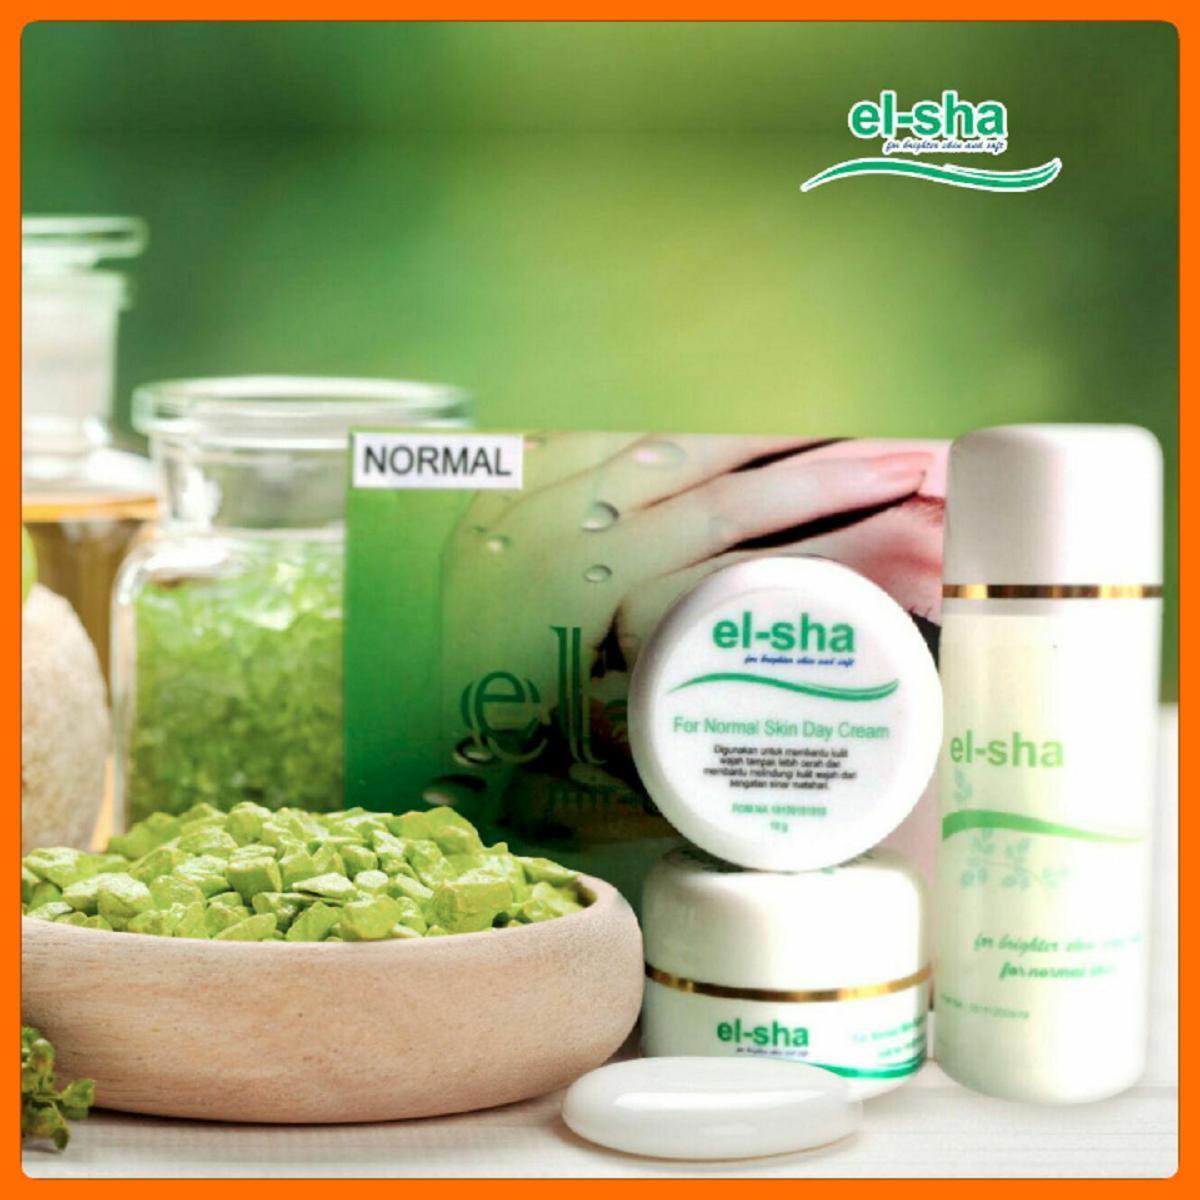 el-sha cream pemutih dan pencerah wajah BPOM tanpa pengelupasan-10 gram memutihkan hanya dalam hitungan hari